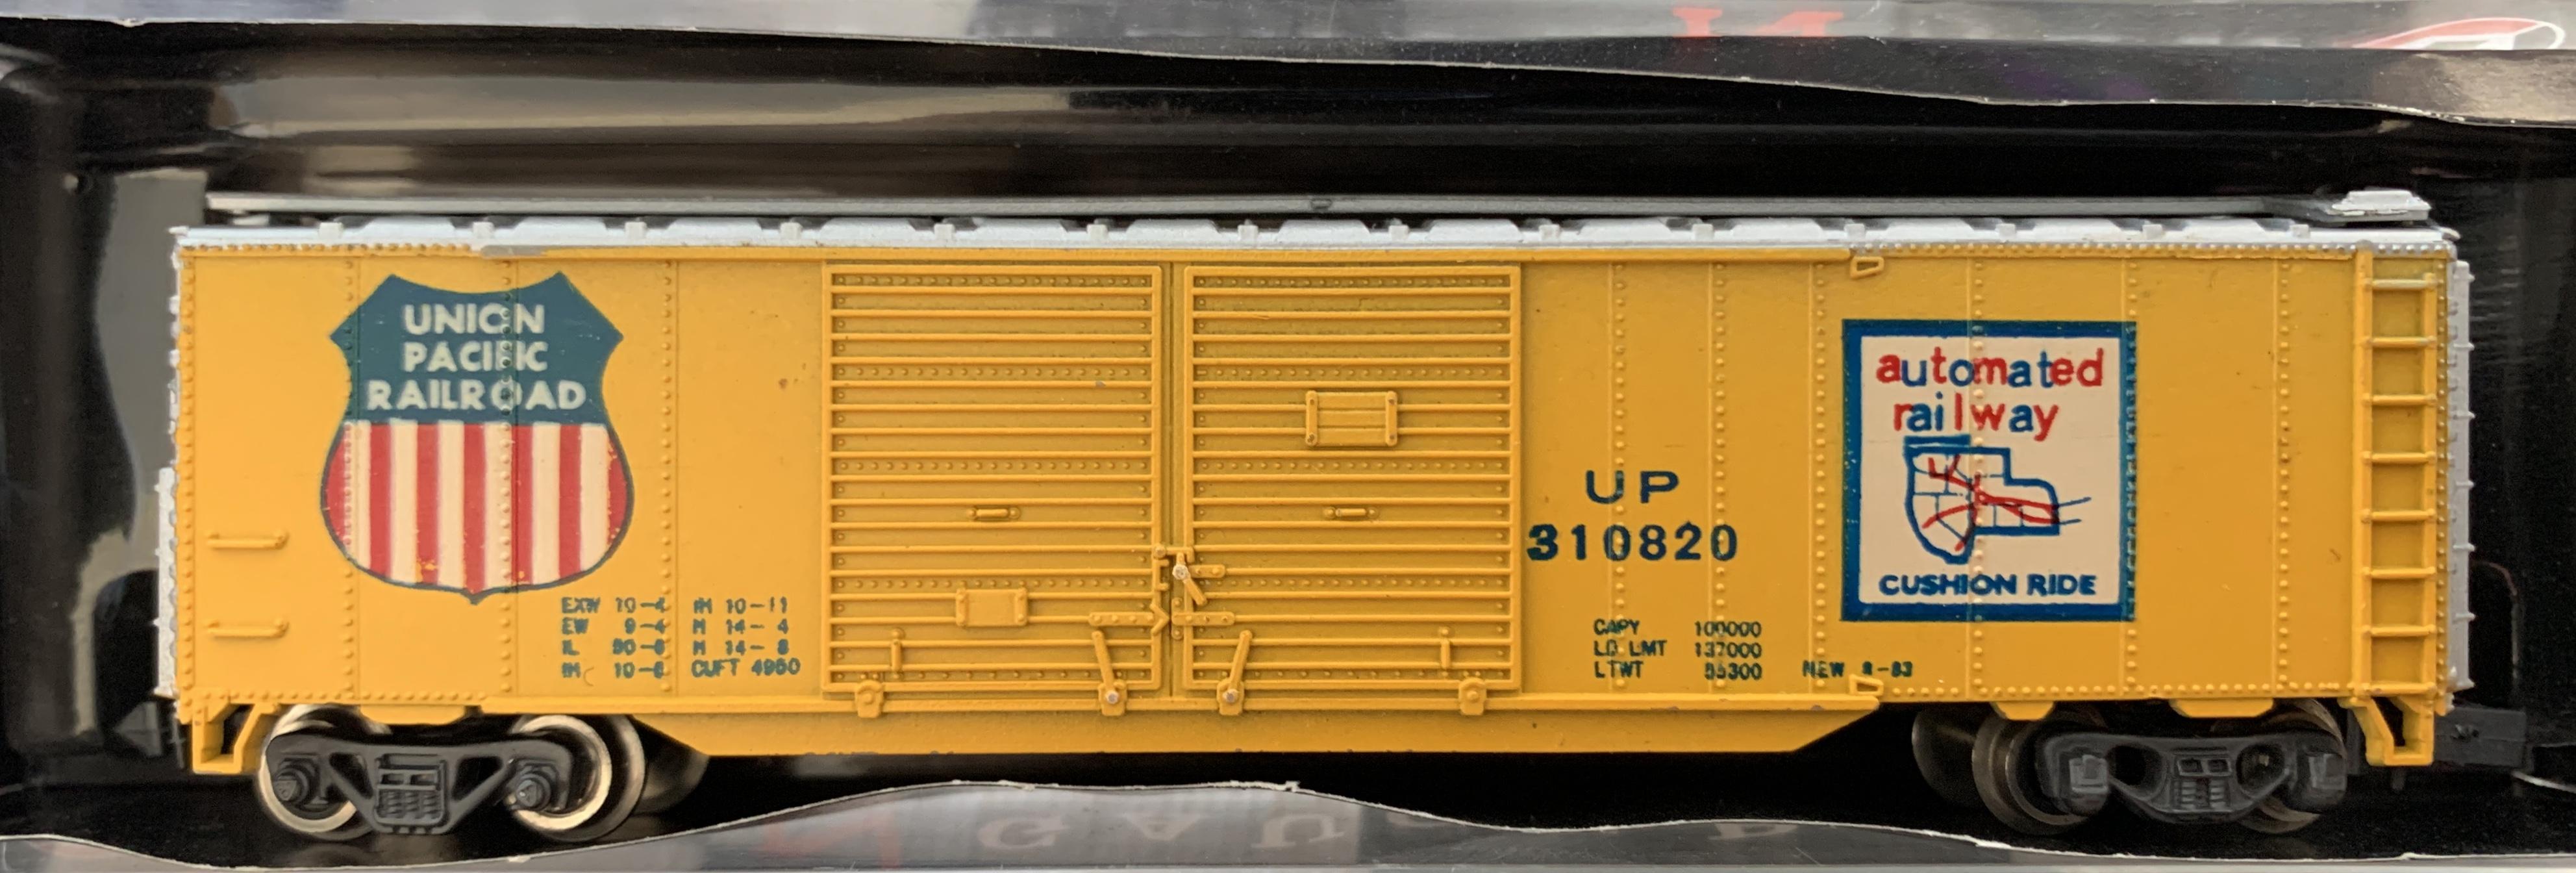 N Scale - MRC - 7030 - Boxcar, 50 Foot, Steel, Double Door - Union Pacific - 310820